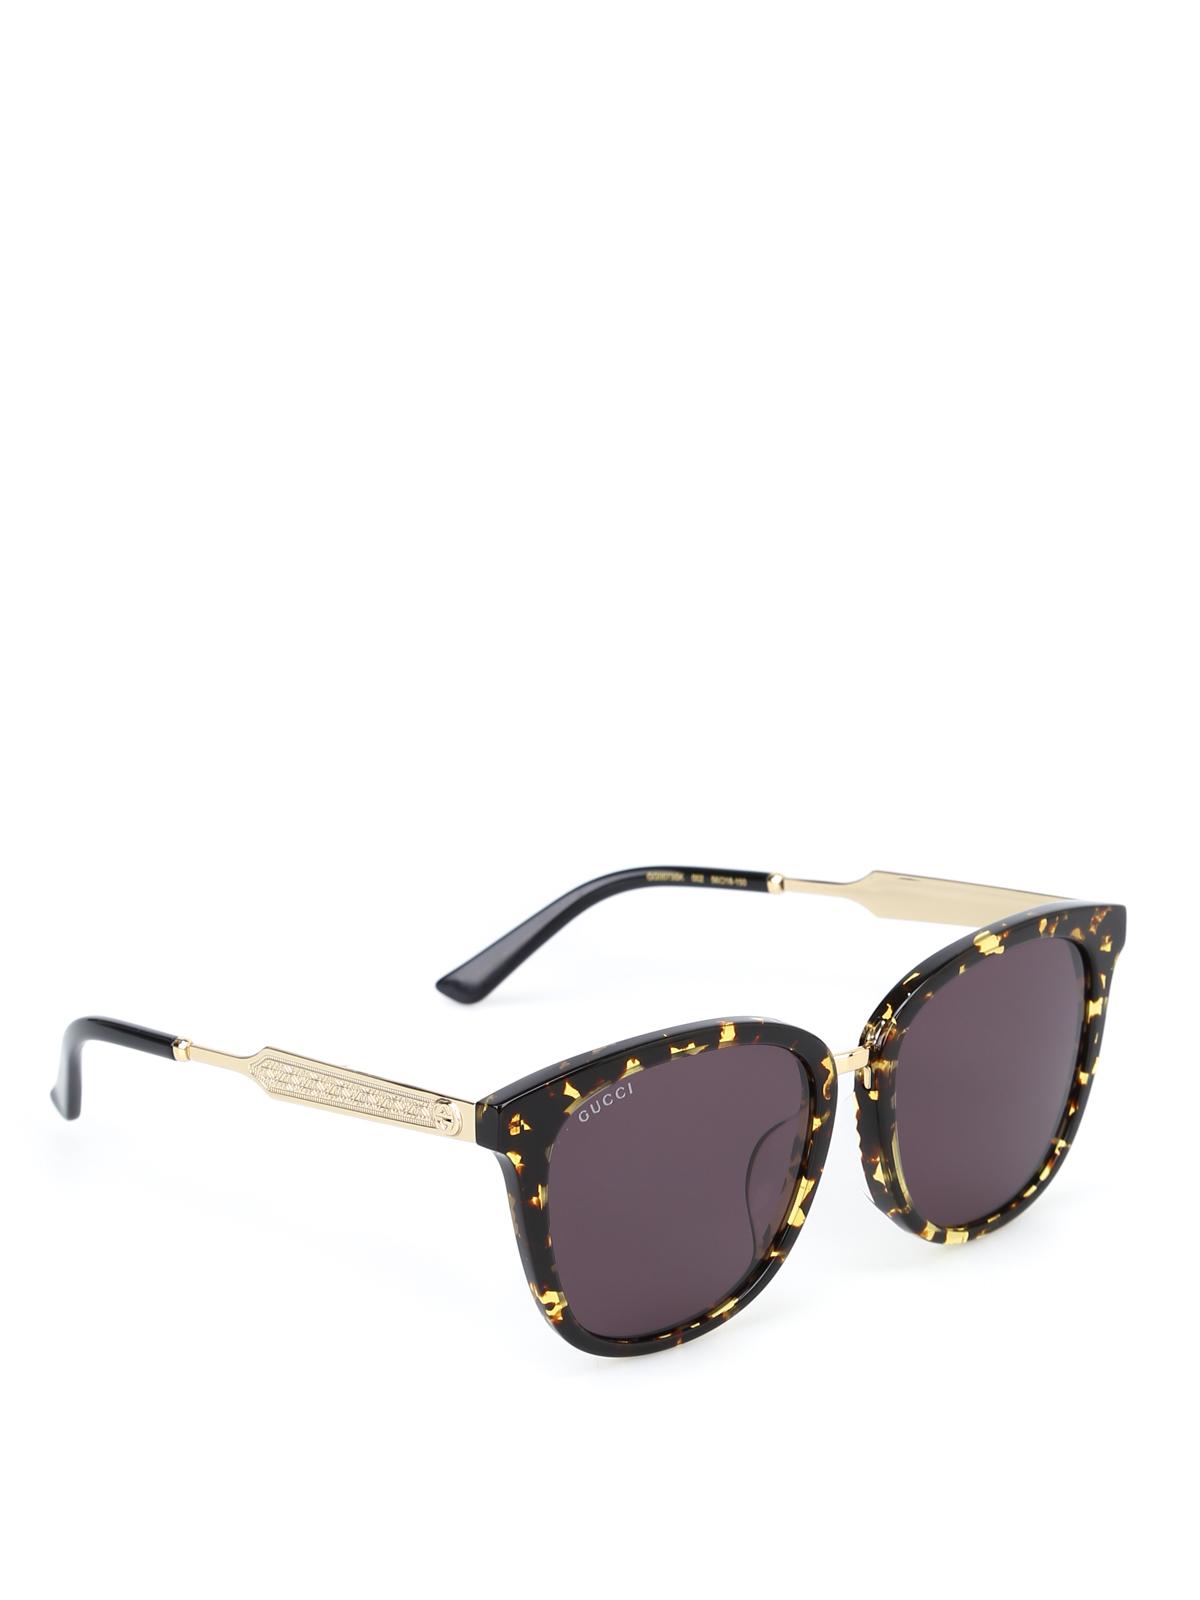 b6954e68b9a Gucci - Spotted tortoiseshell sunglasses - sunglasses - GG0073SK 002